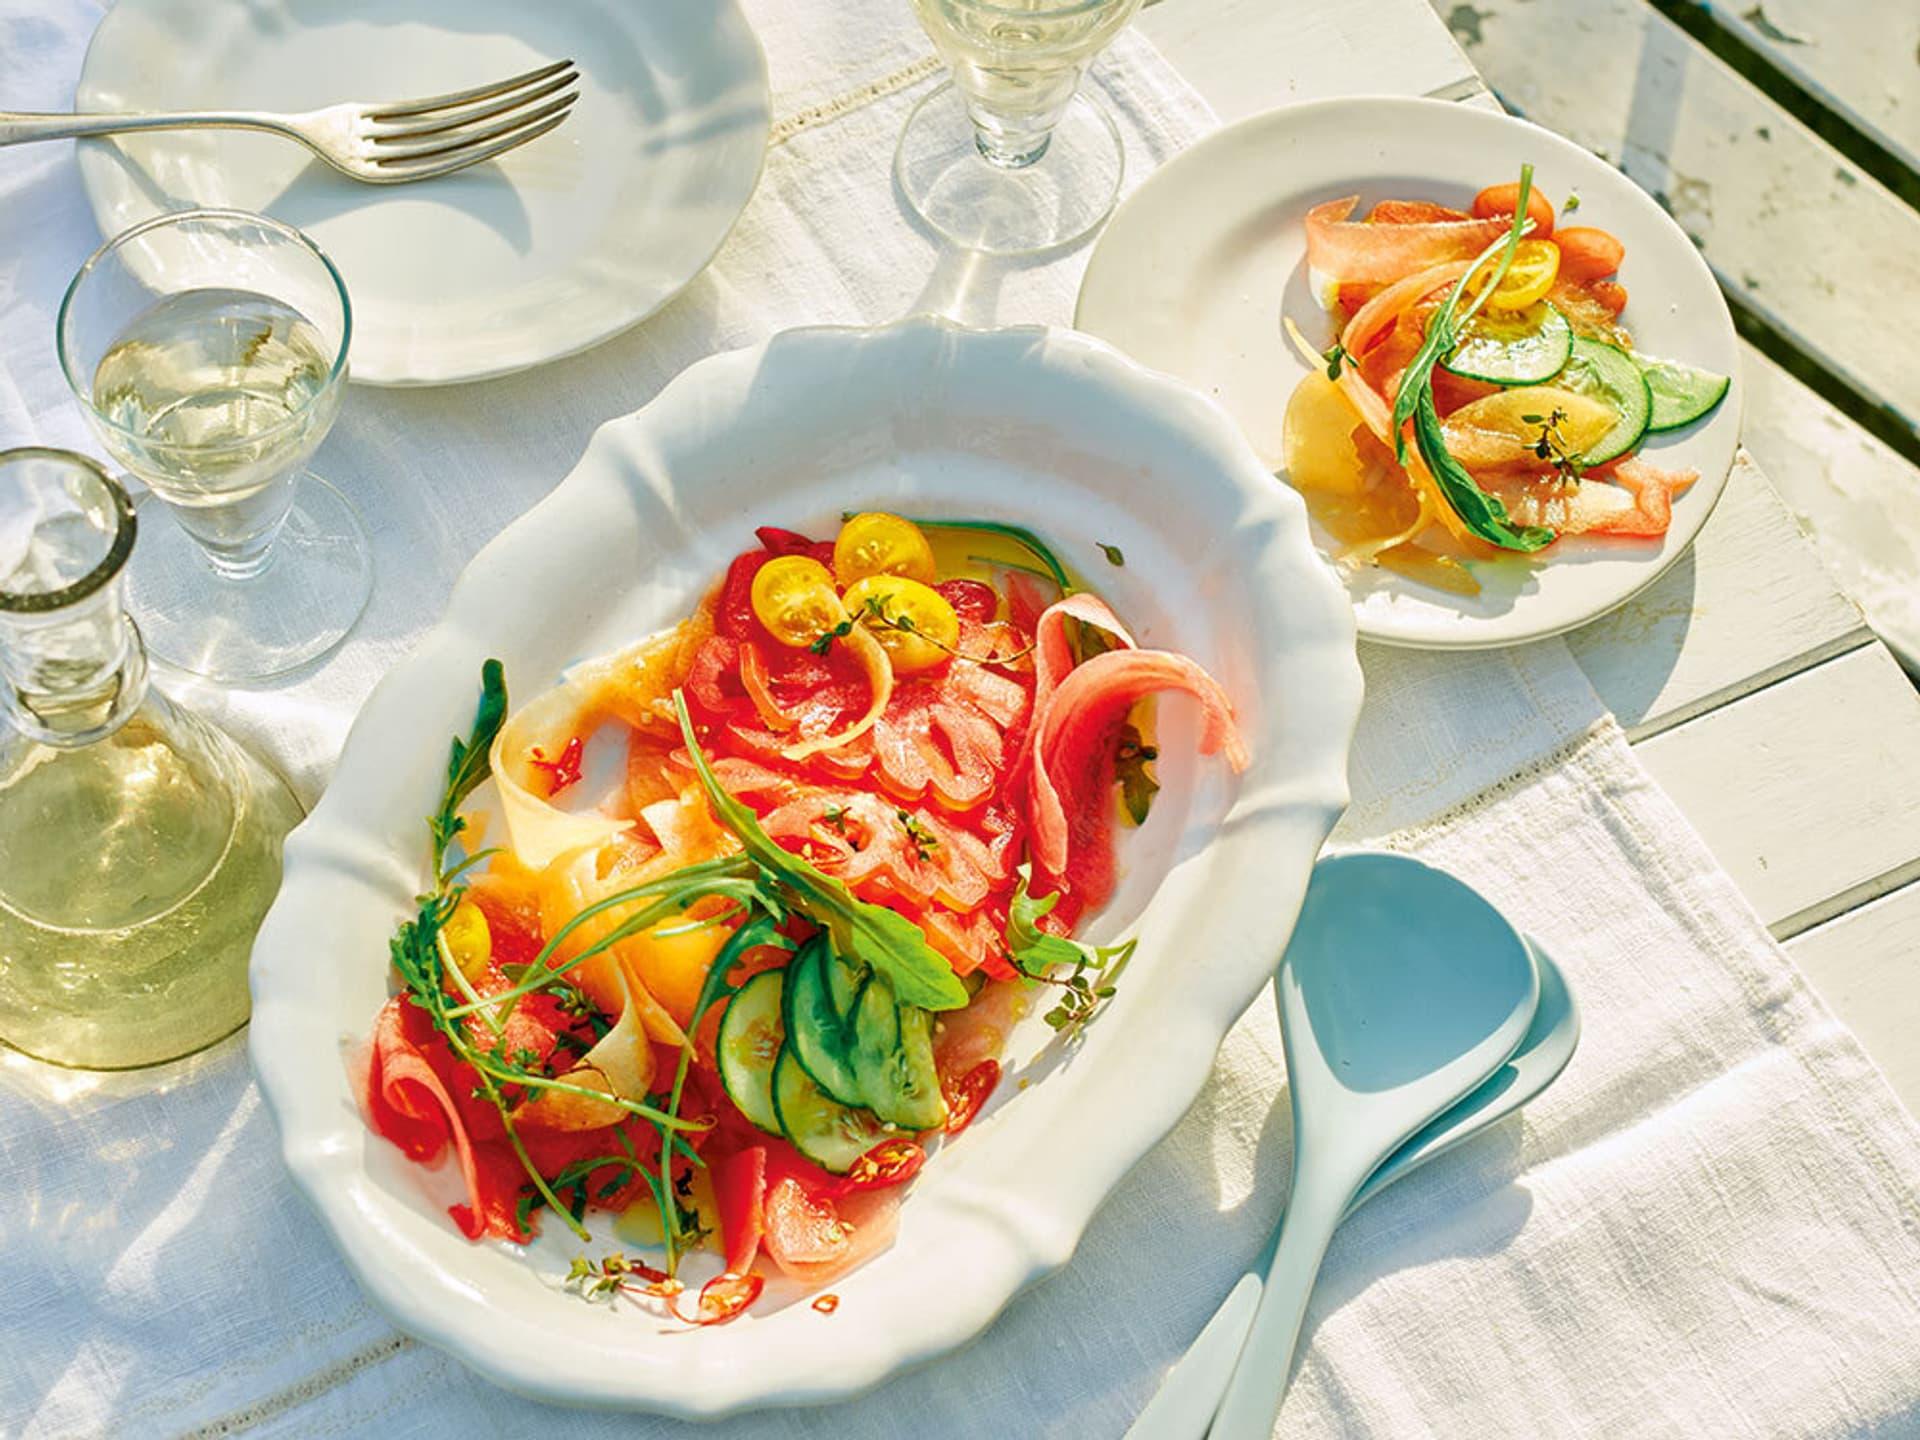 Melonen-Tomaten-Salat